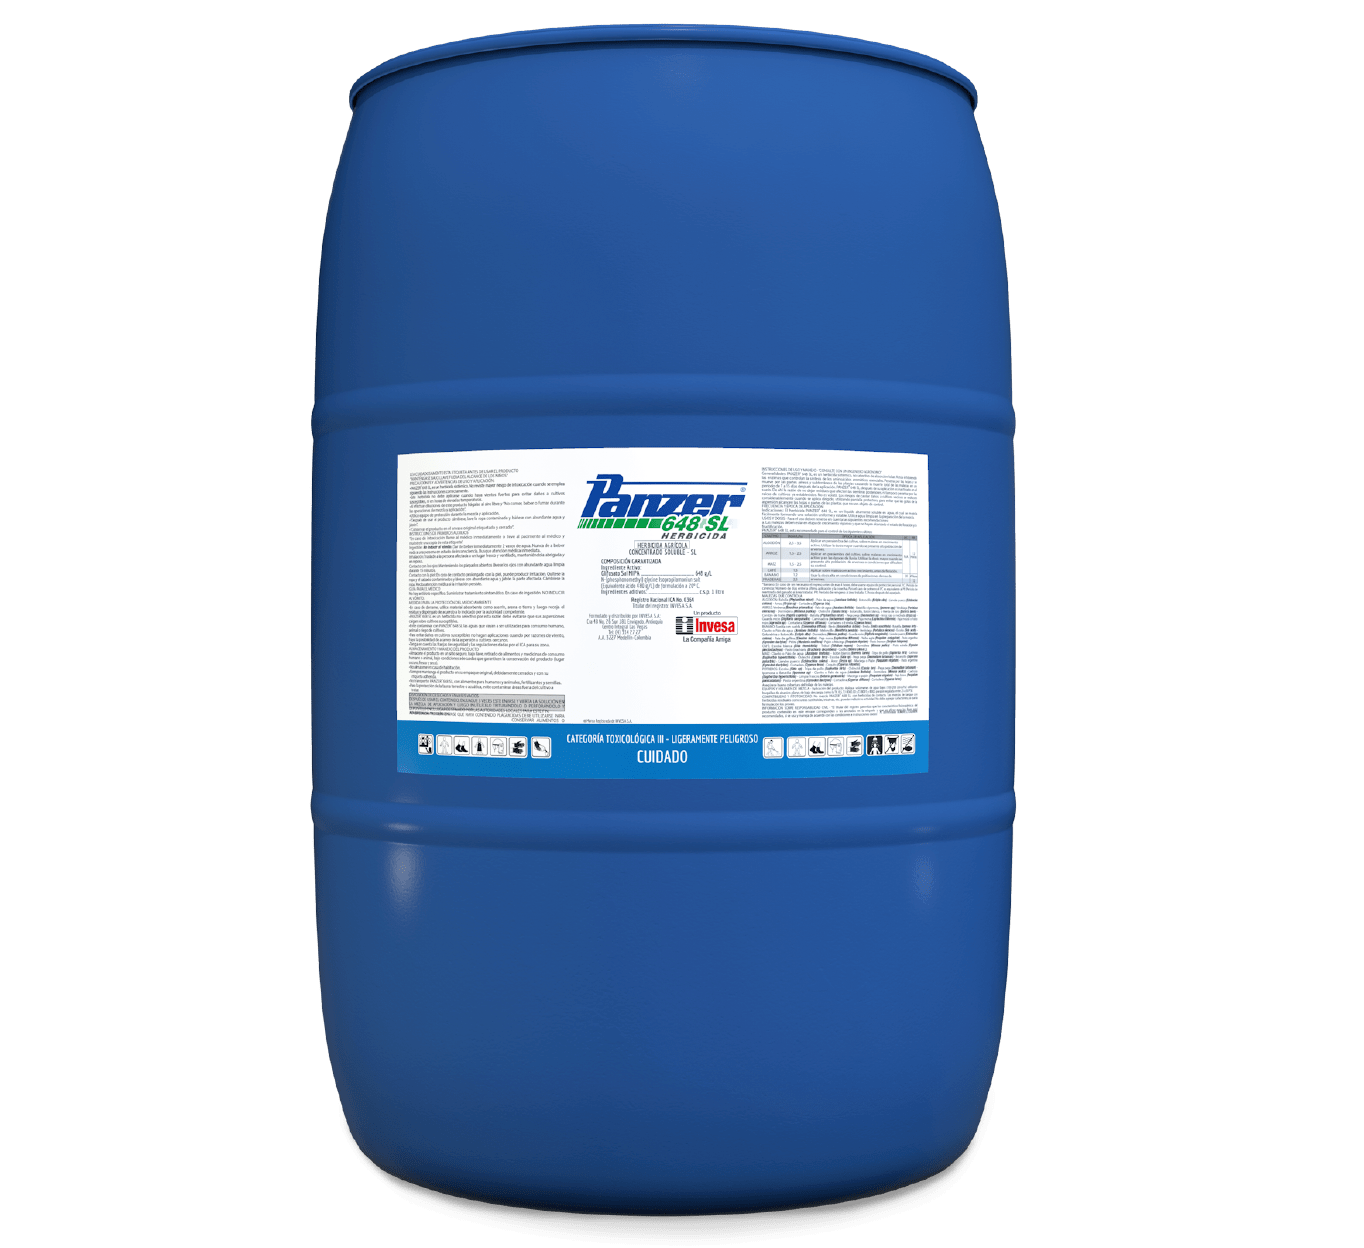 Herbicida panzer 648 invesa 200 litros